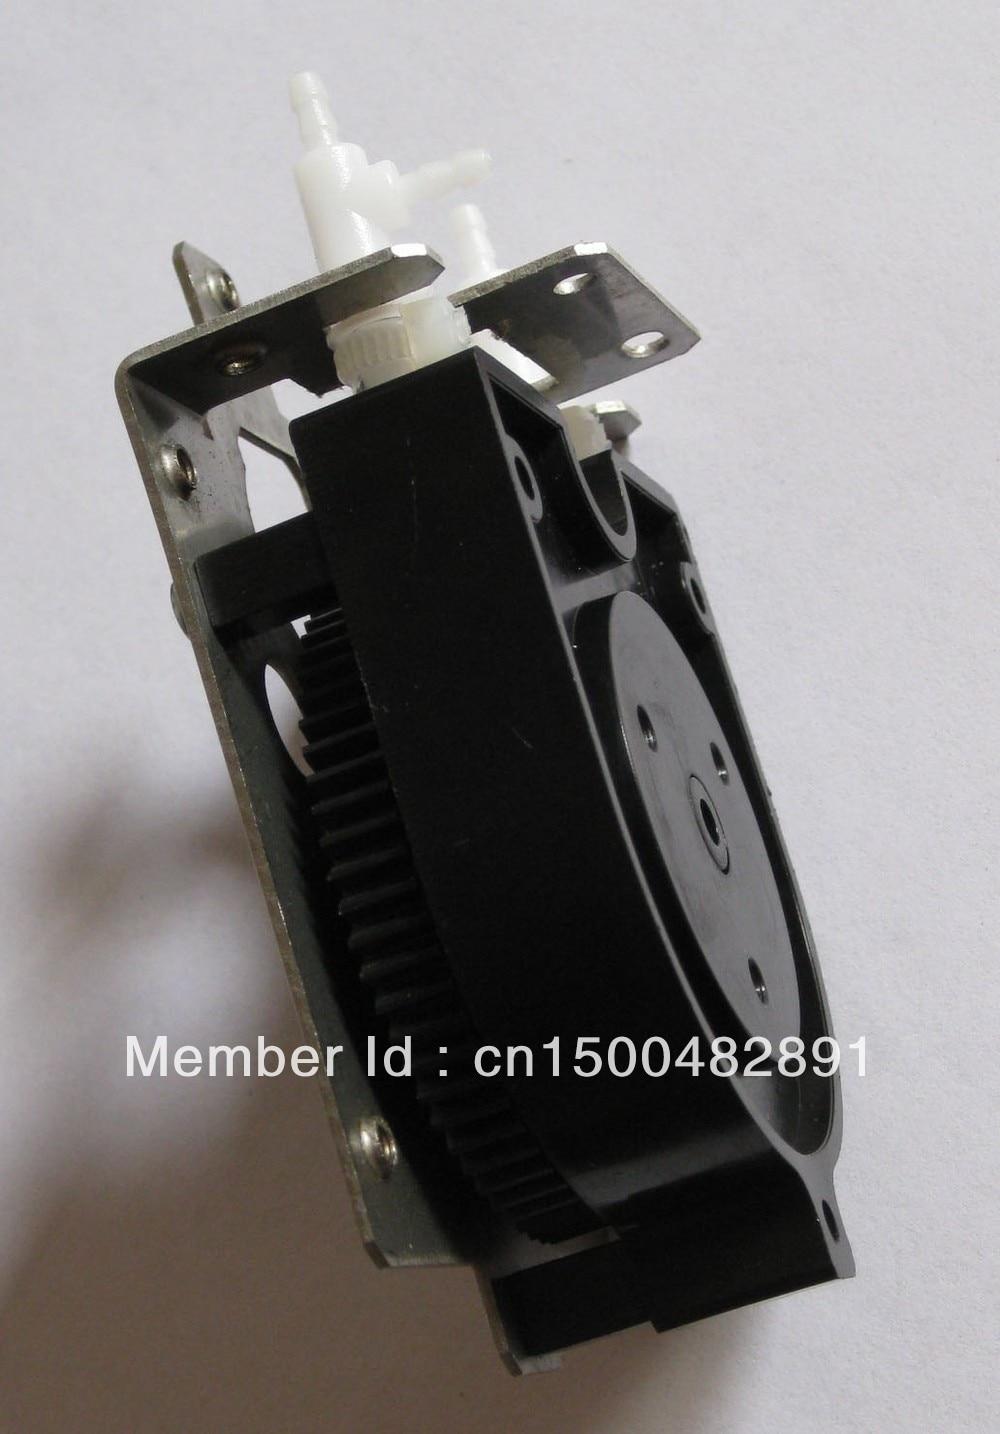 U-type pump for Roland SP/XC/VP/RS series printers вокальный процессор roland vp 03